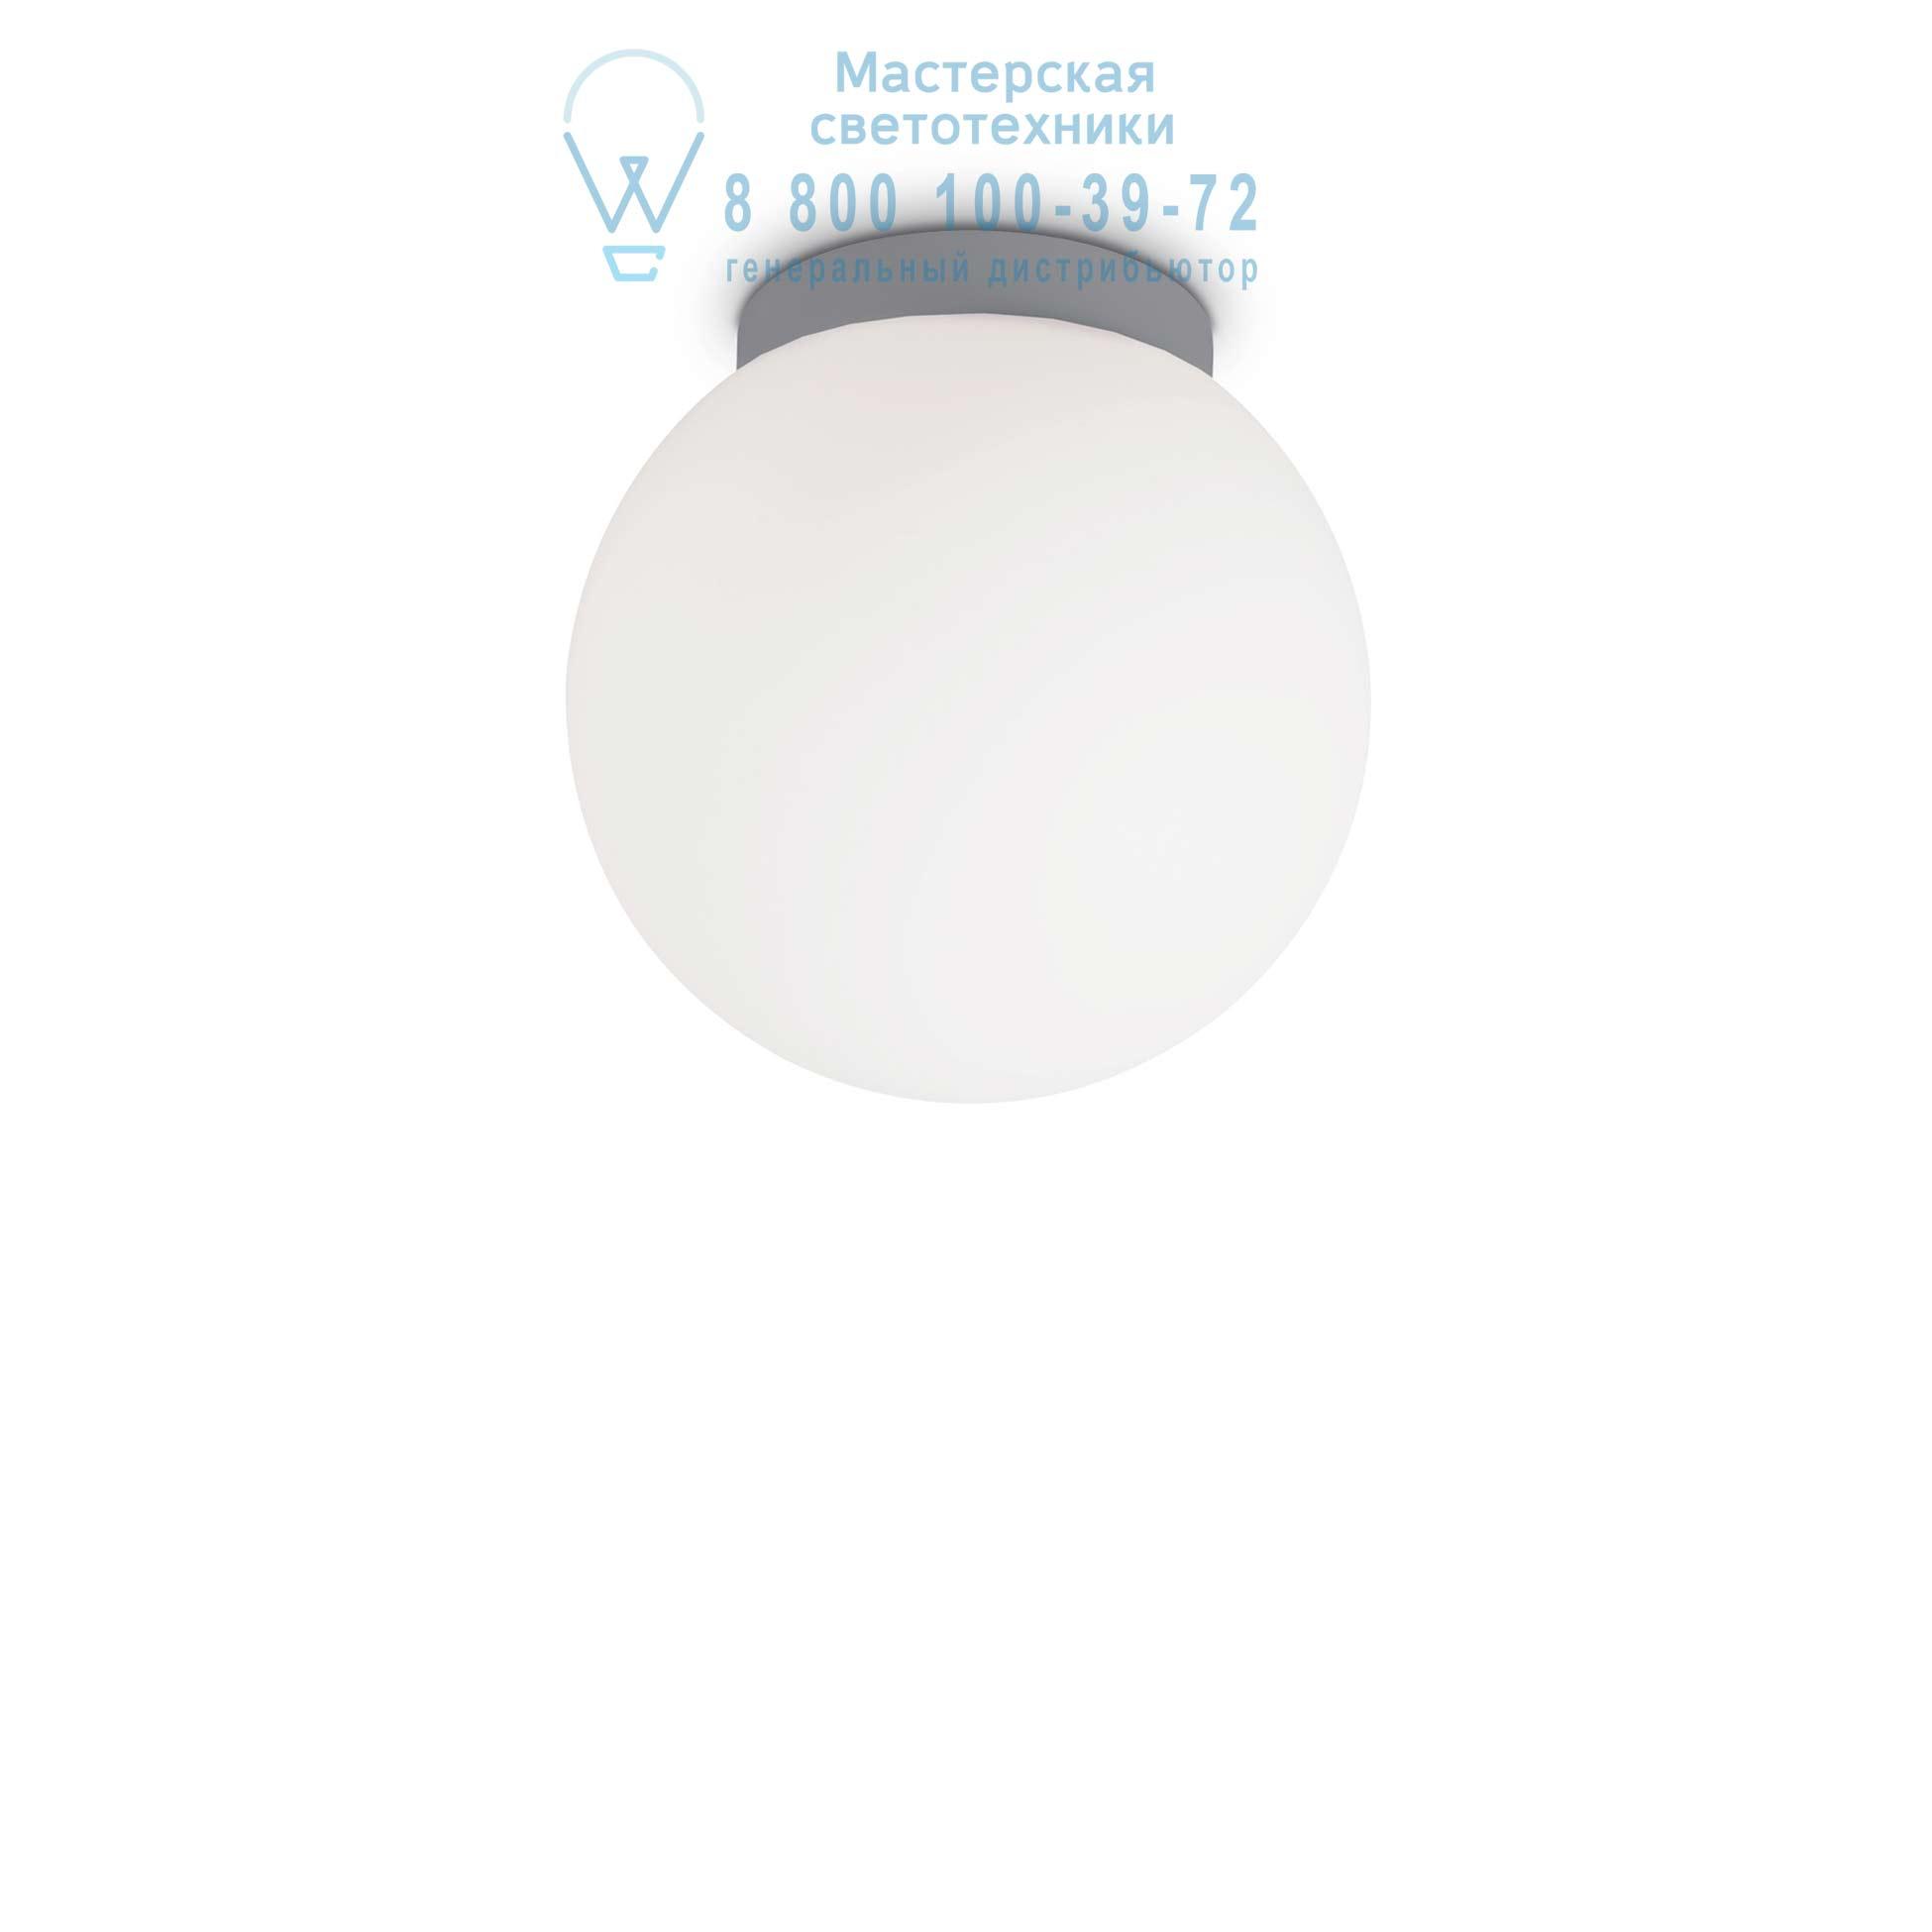 SOLE PL1 SMALL уличный потолочный светильник белый